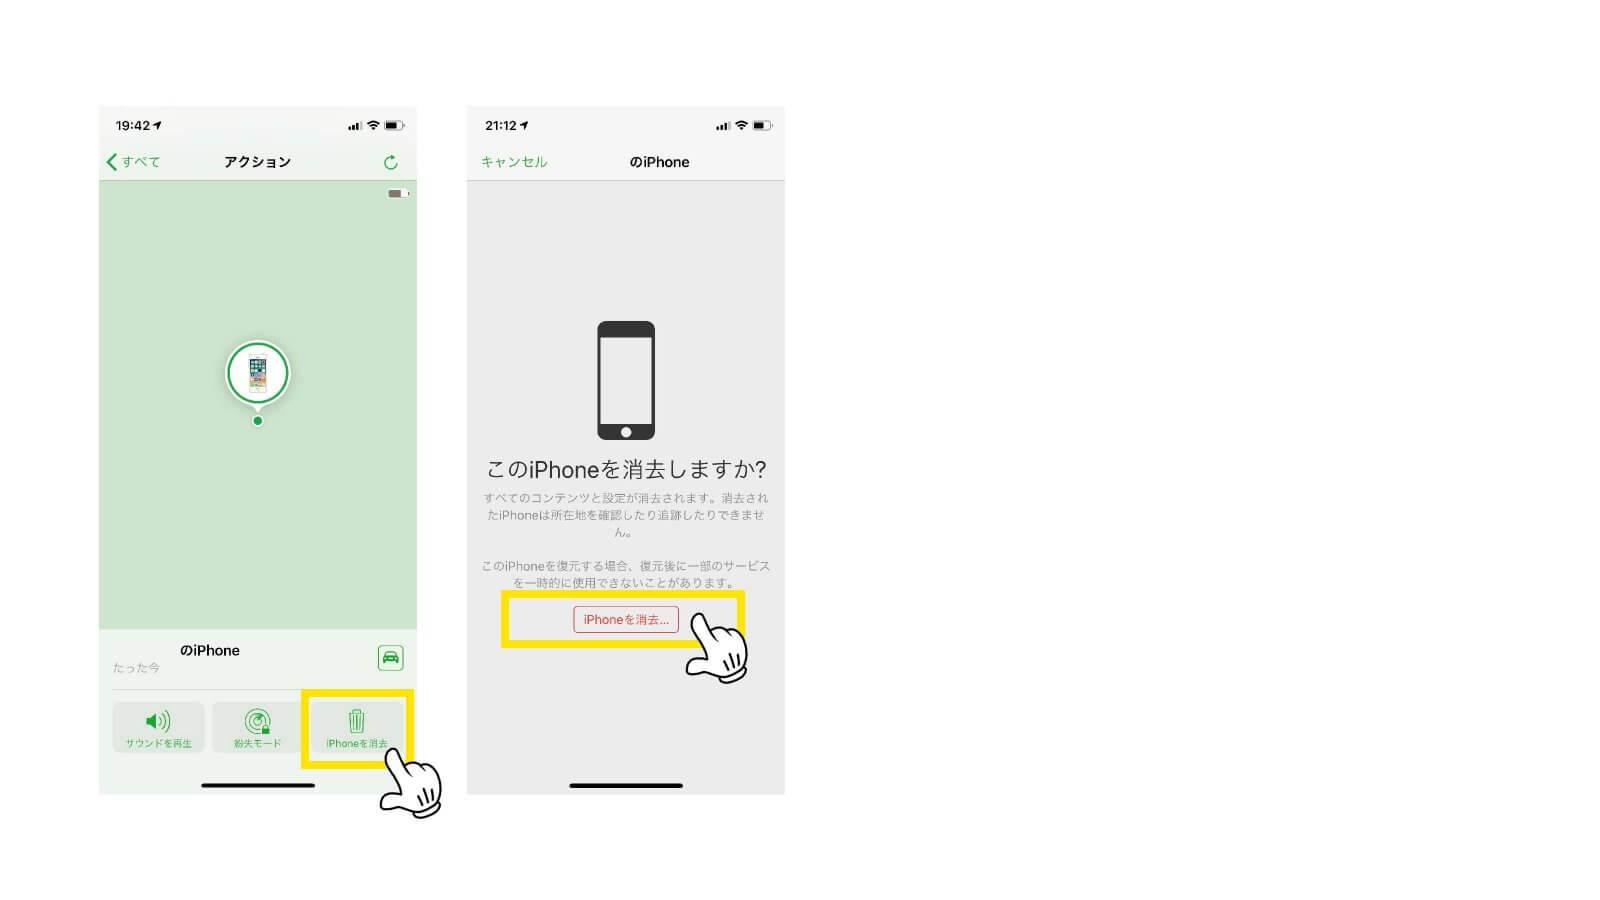 iphone操作。「iphoneを消去」する方法。